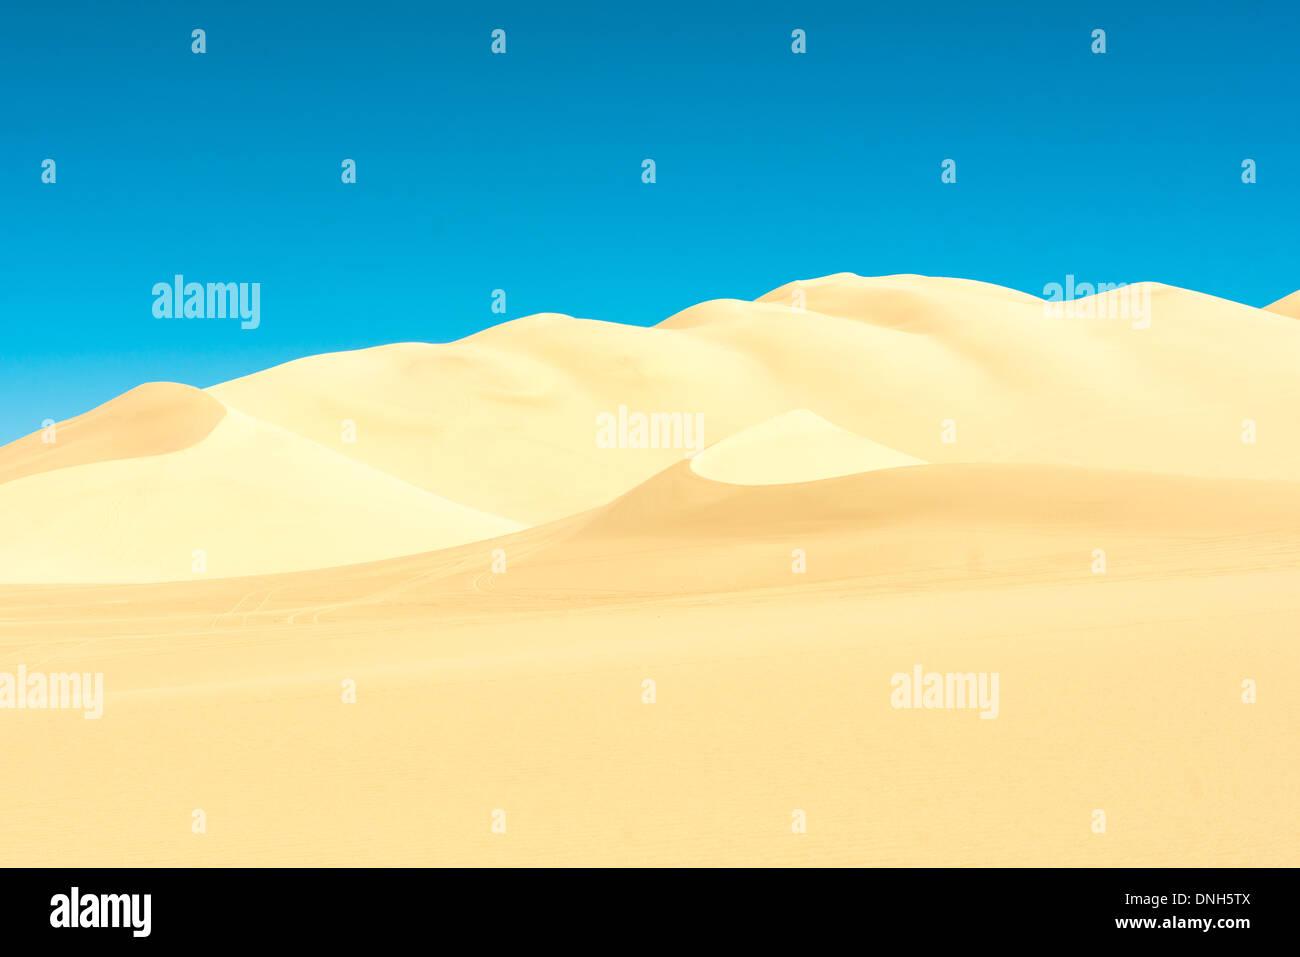 Dumont dunes in California - Stock Image